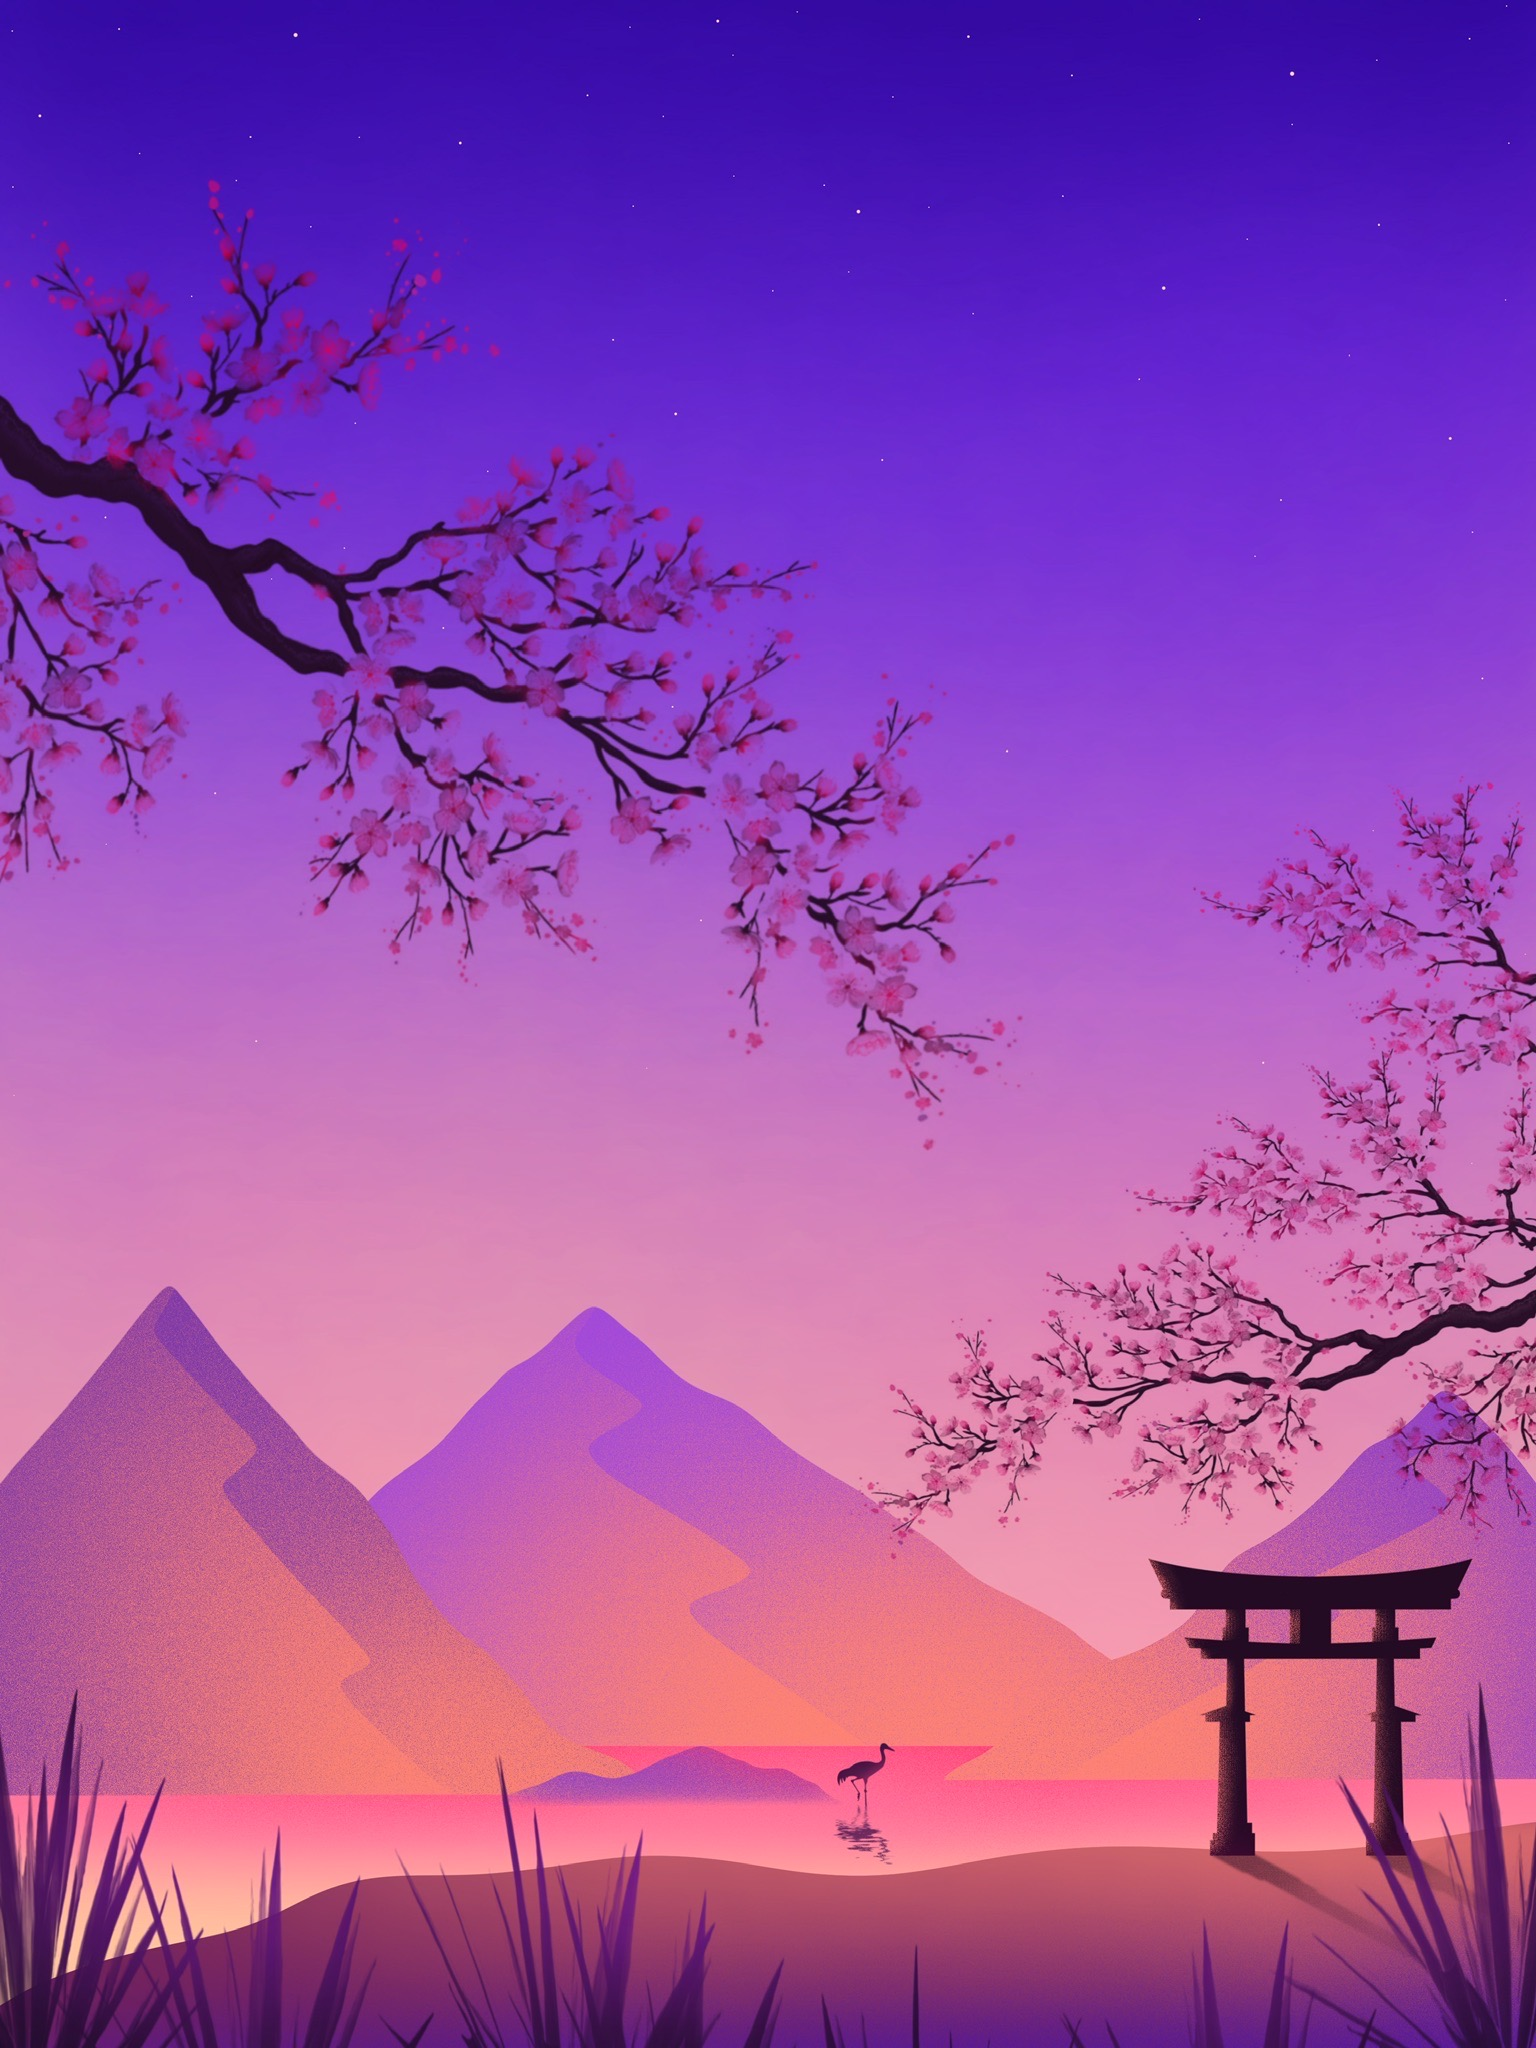 87153 Screensavers and Wallpapers Sakura for phone. Download Sakura, Art, Mountains, Violet, Purple, Crane, Torii, Gate, Goal pictures for free